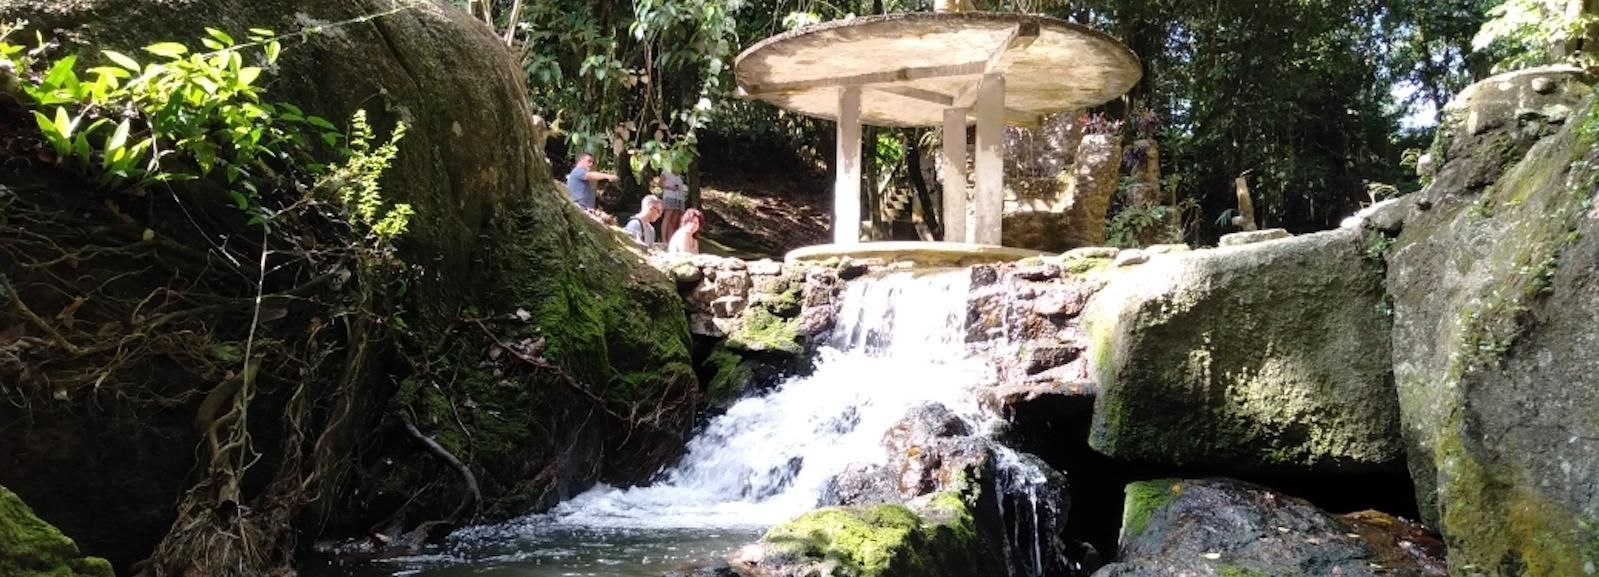 Koh Samui: point de vue et trek au Secret Buddha Garden